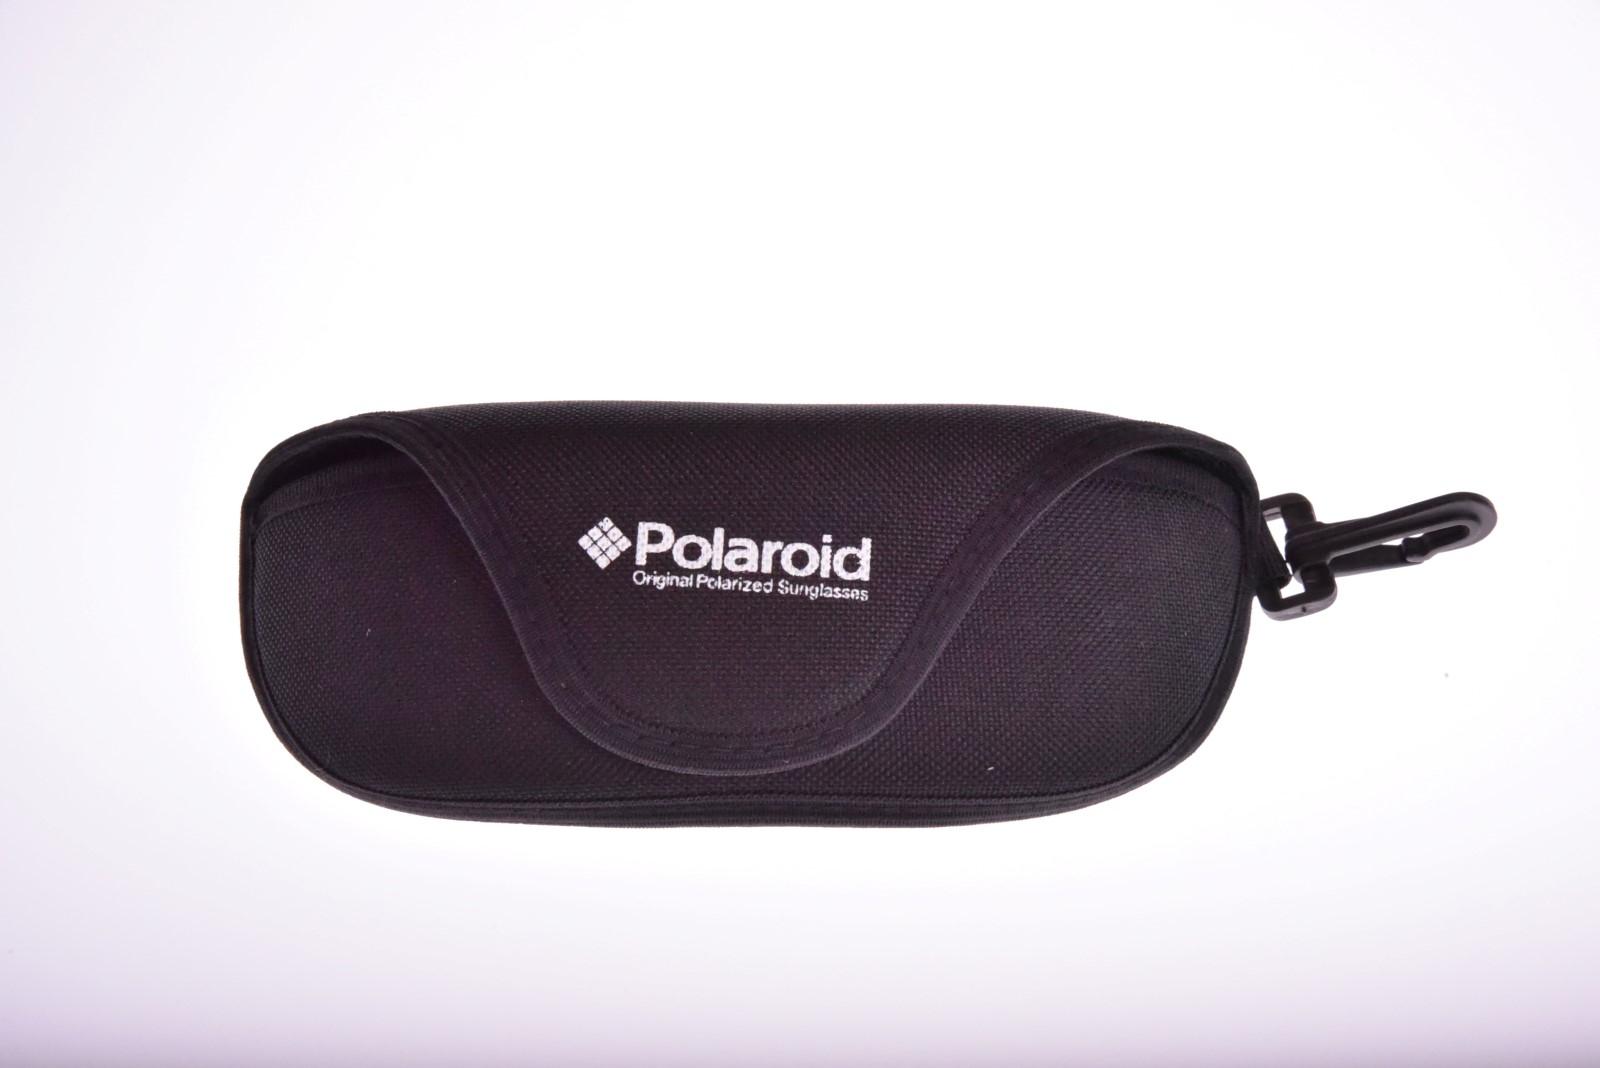 Púzdro na okuliare Polaroid - Doplnky k okuliarom - GemaShop.sk fea5a5db03c